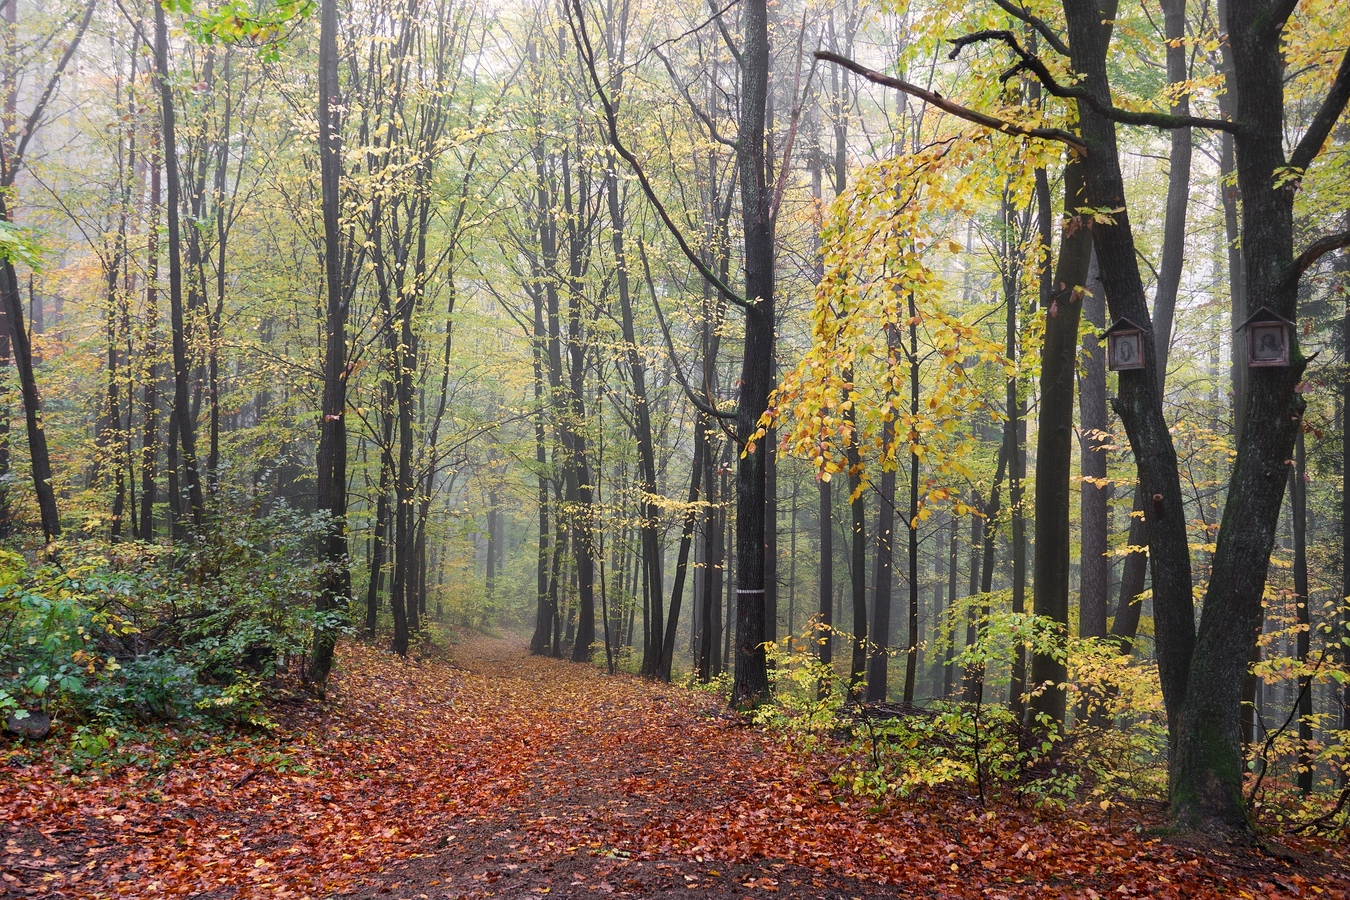 Za mlhy v lese